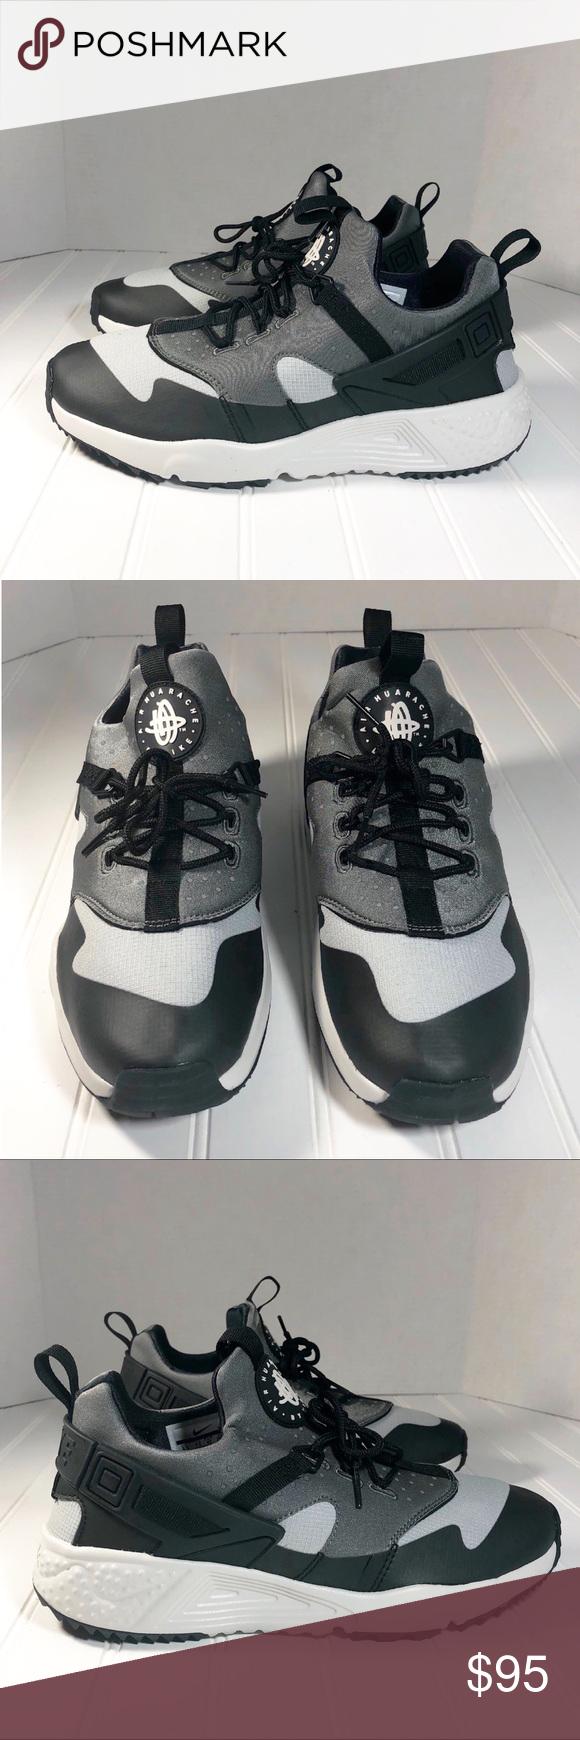 huge discount 3ec79 6d294 Nike Huarache Utility Gray 806807-003 Size 8.5 New without box Nike  Huarache Utility Base Gray Style ID  806807-003 Brand  Nike Color  Silver Black White  ...